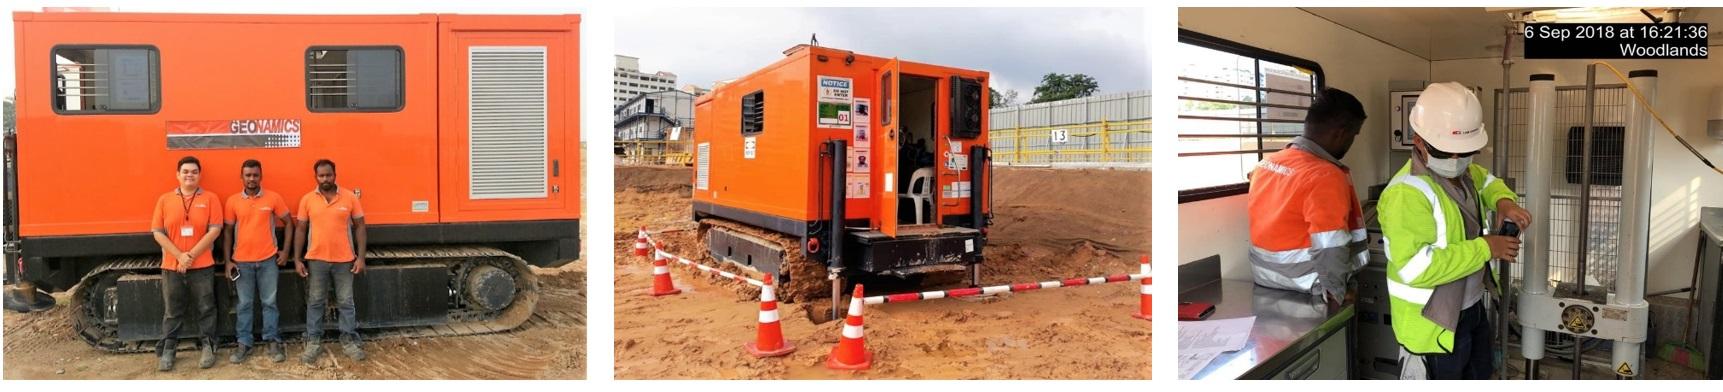 Soil-site-Investigation company-companies Singapore-Cone Penetration Test (CPT) - Geonamics (S) Pte Ltd